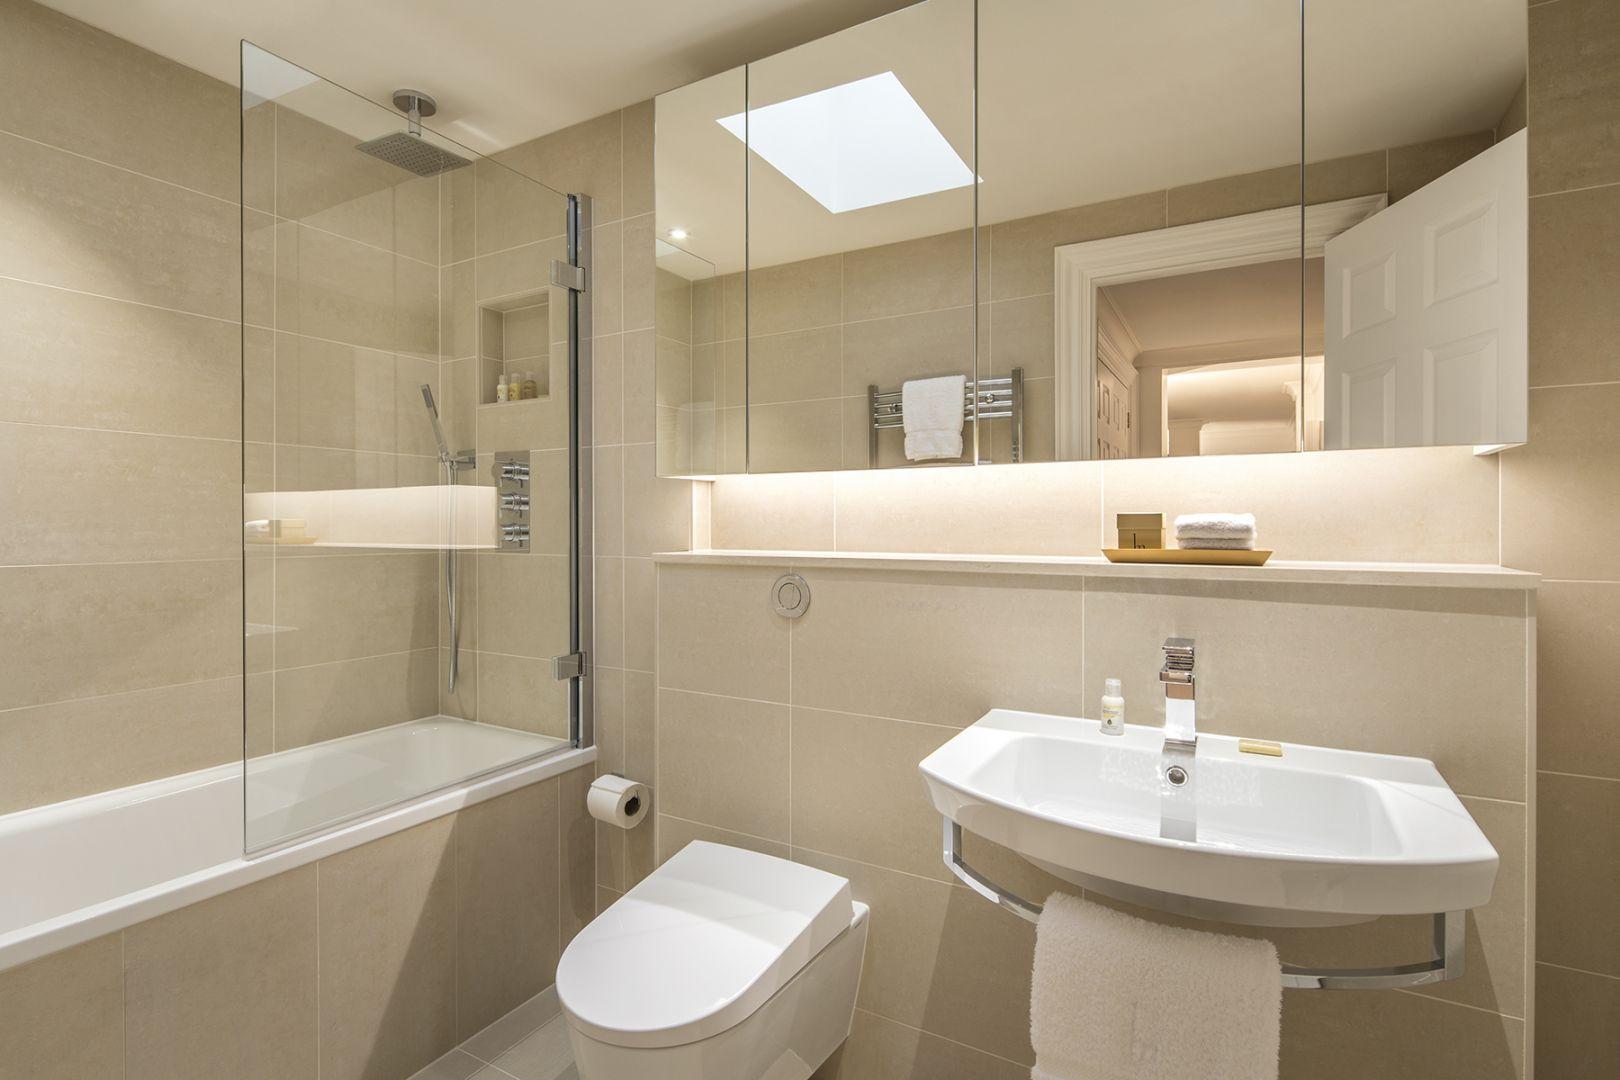 COMO Metropolitan Apartments - Hertford Street, London W1J 7RZ